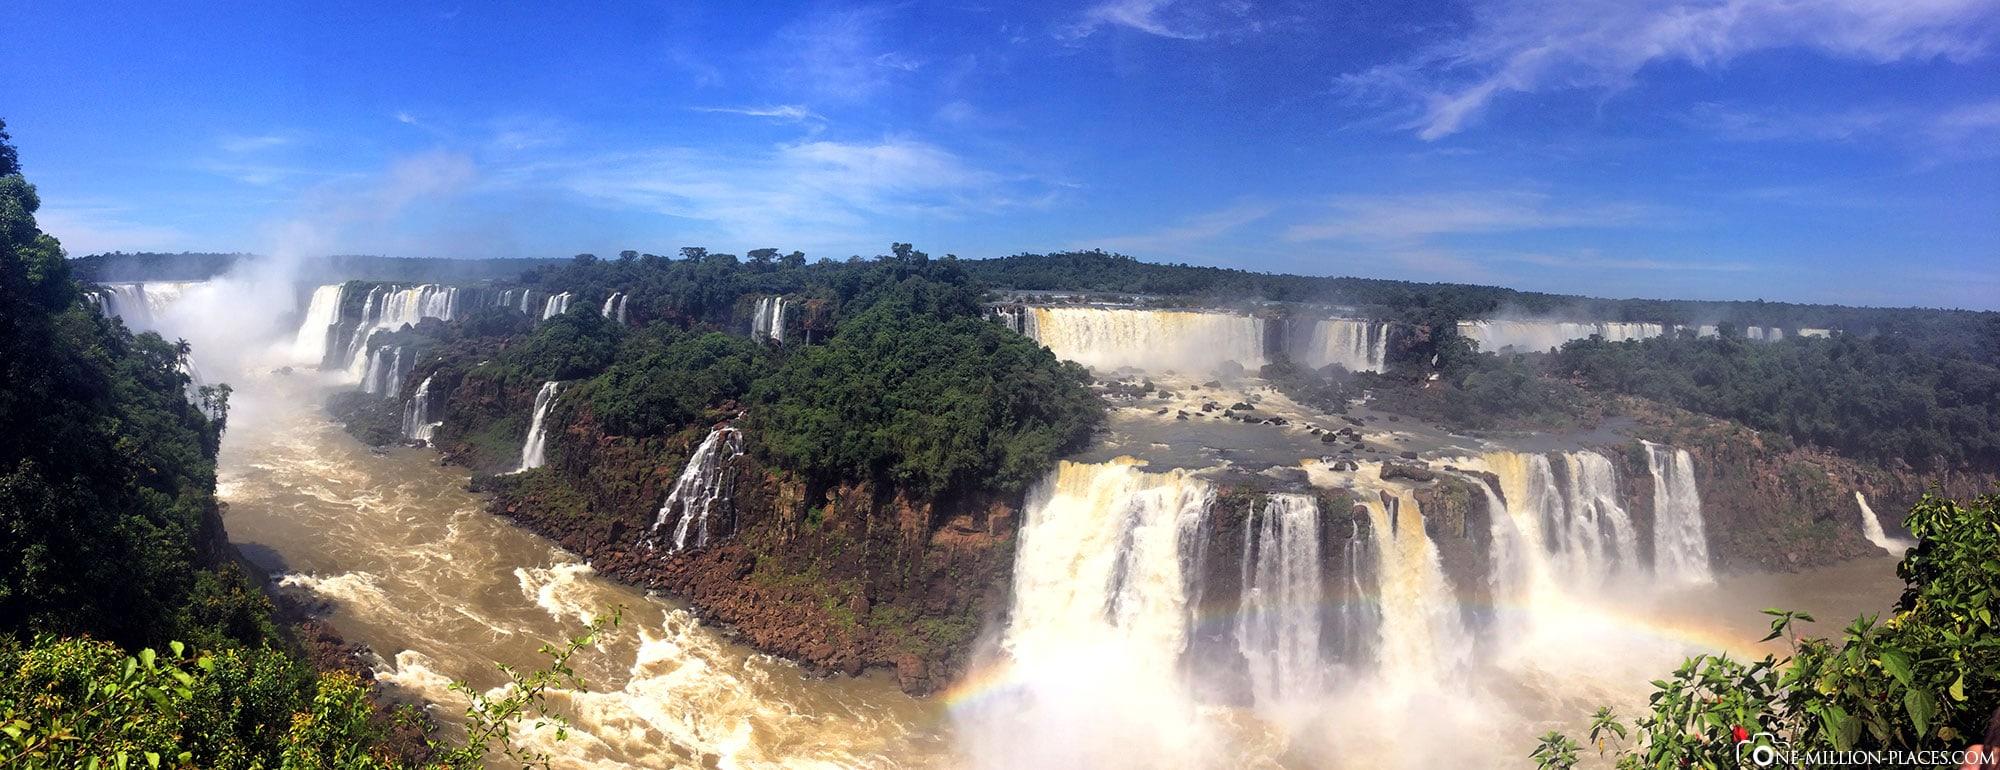 Panoramic view, Iguazu waterfalls, Iguau National Park, Brazil, On your own, Travelreport